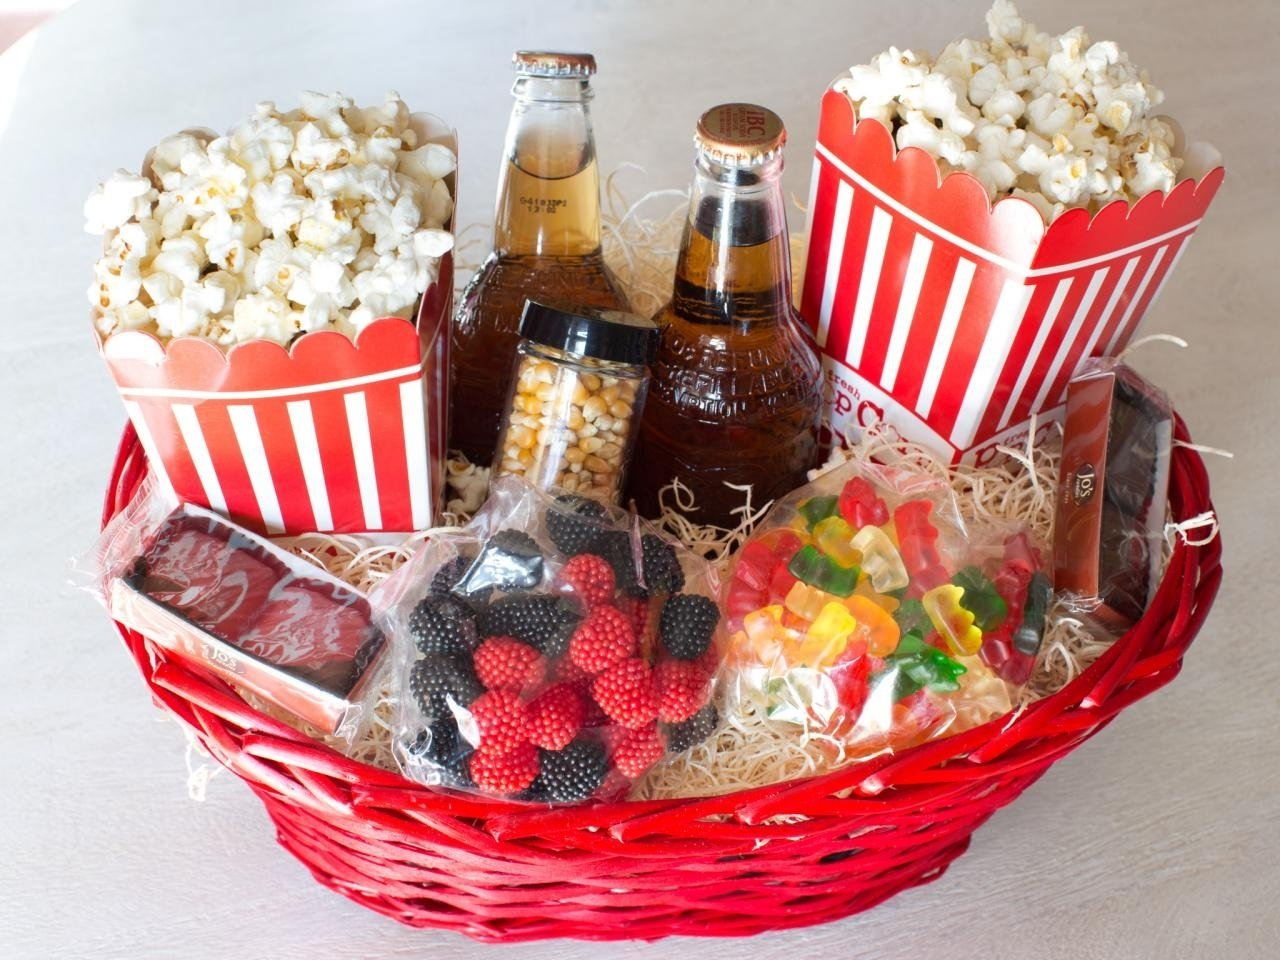 10 Fabulous Diy Christmas Gift Basket Ideas christmas gift baskets hgtv christmas gifts and homemade 3 2020